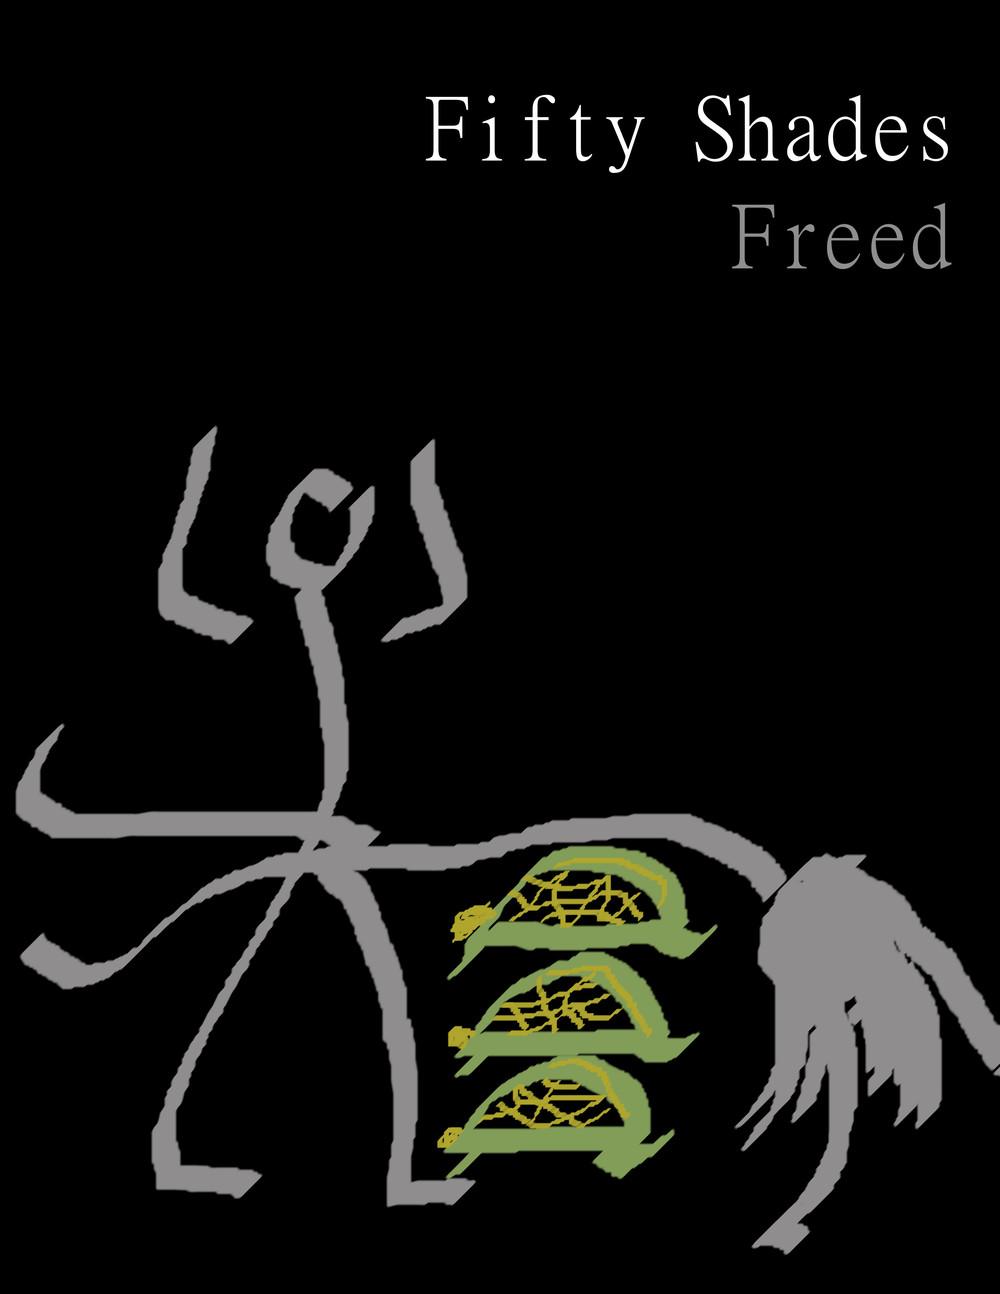 50 Shades Freed by E J Lames